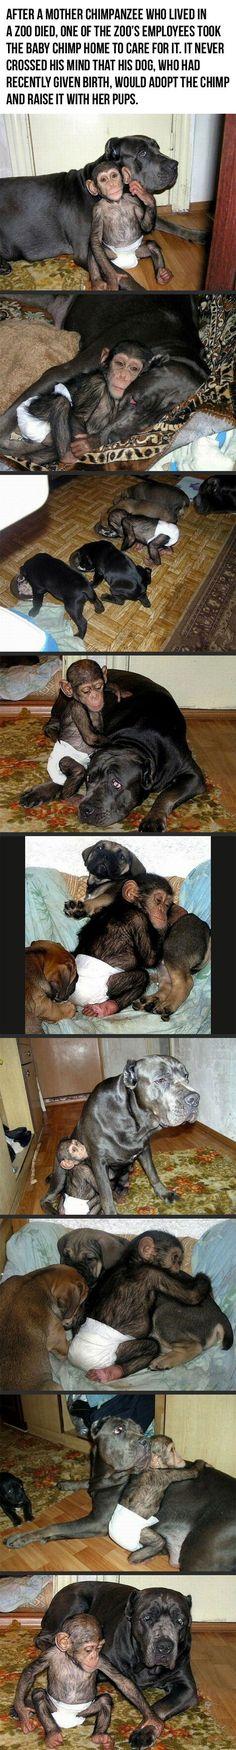 Dog Adopts Chimp-special